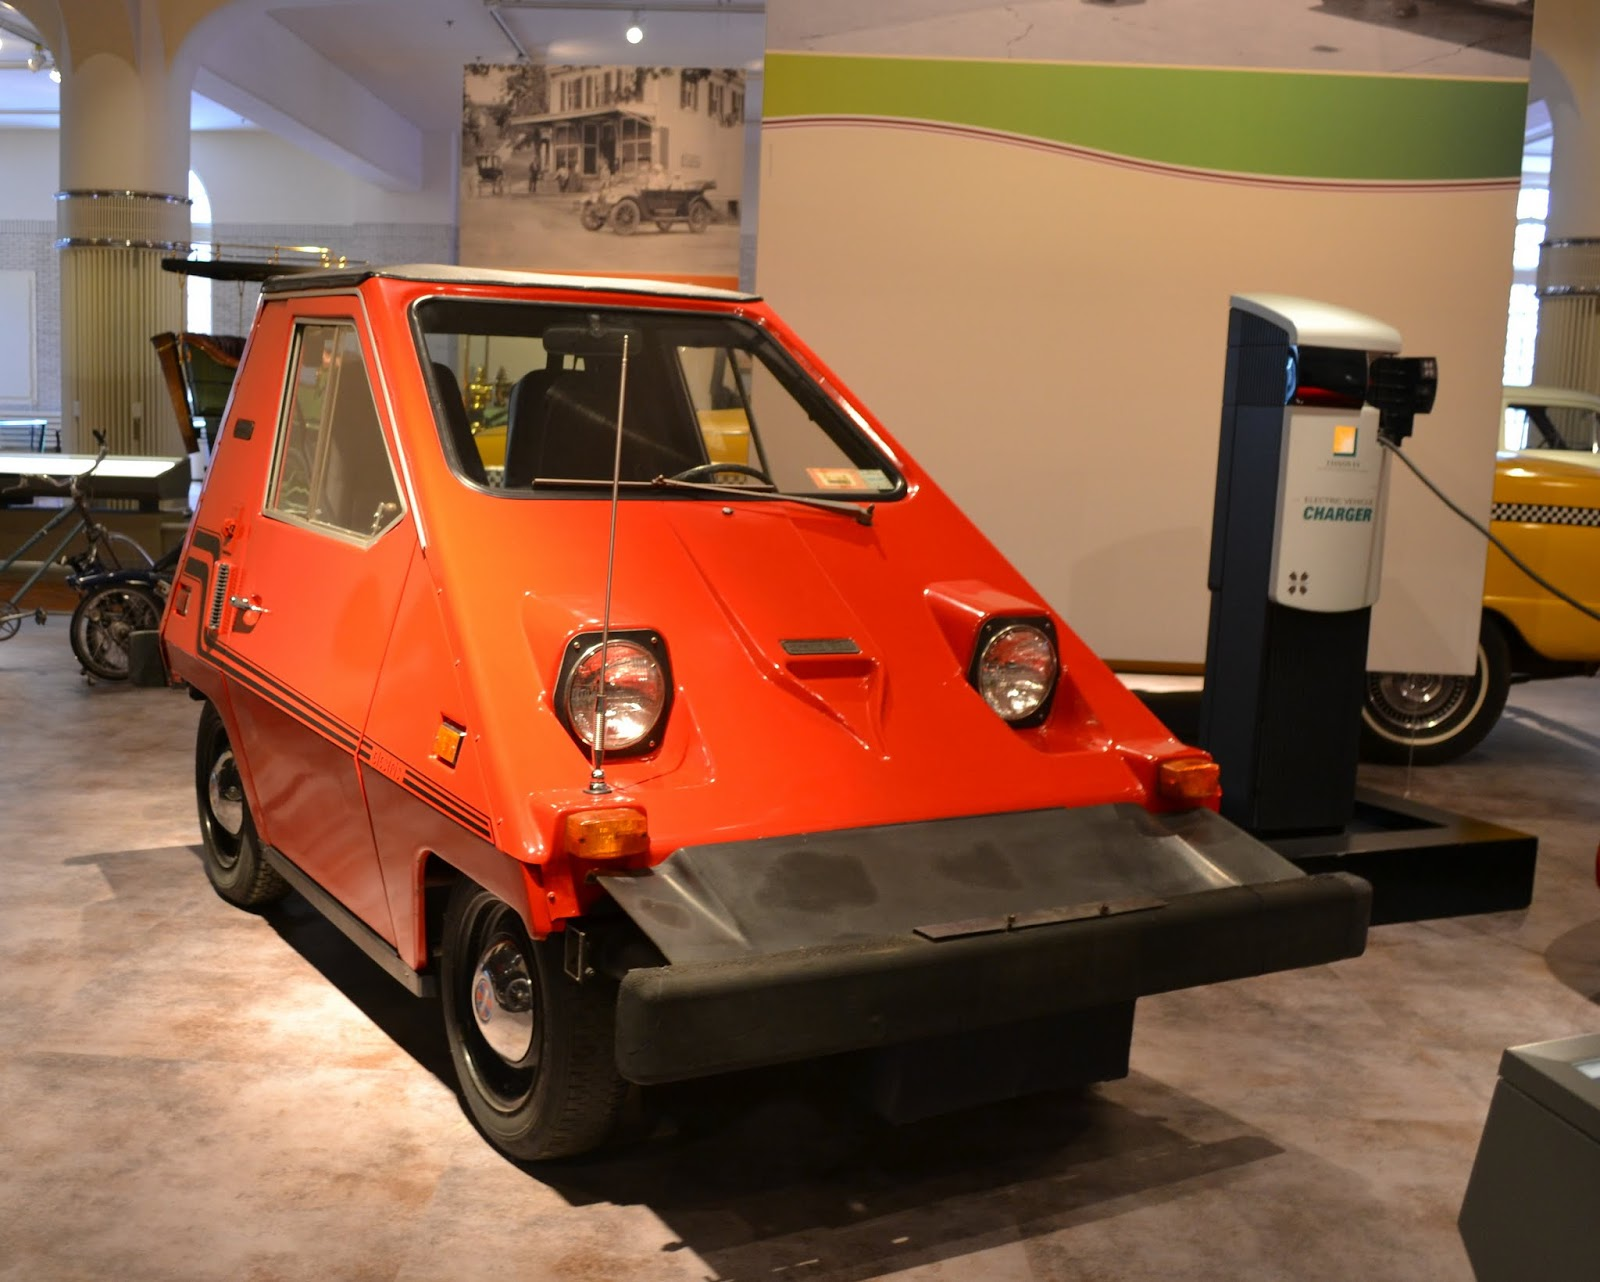 Comuta-Car, 1980 года. Музей Генри Форда. Дирборн, Мичиган (Henry Ford Museum, Dearborn, MI)